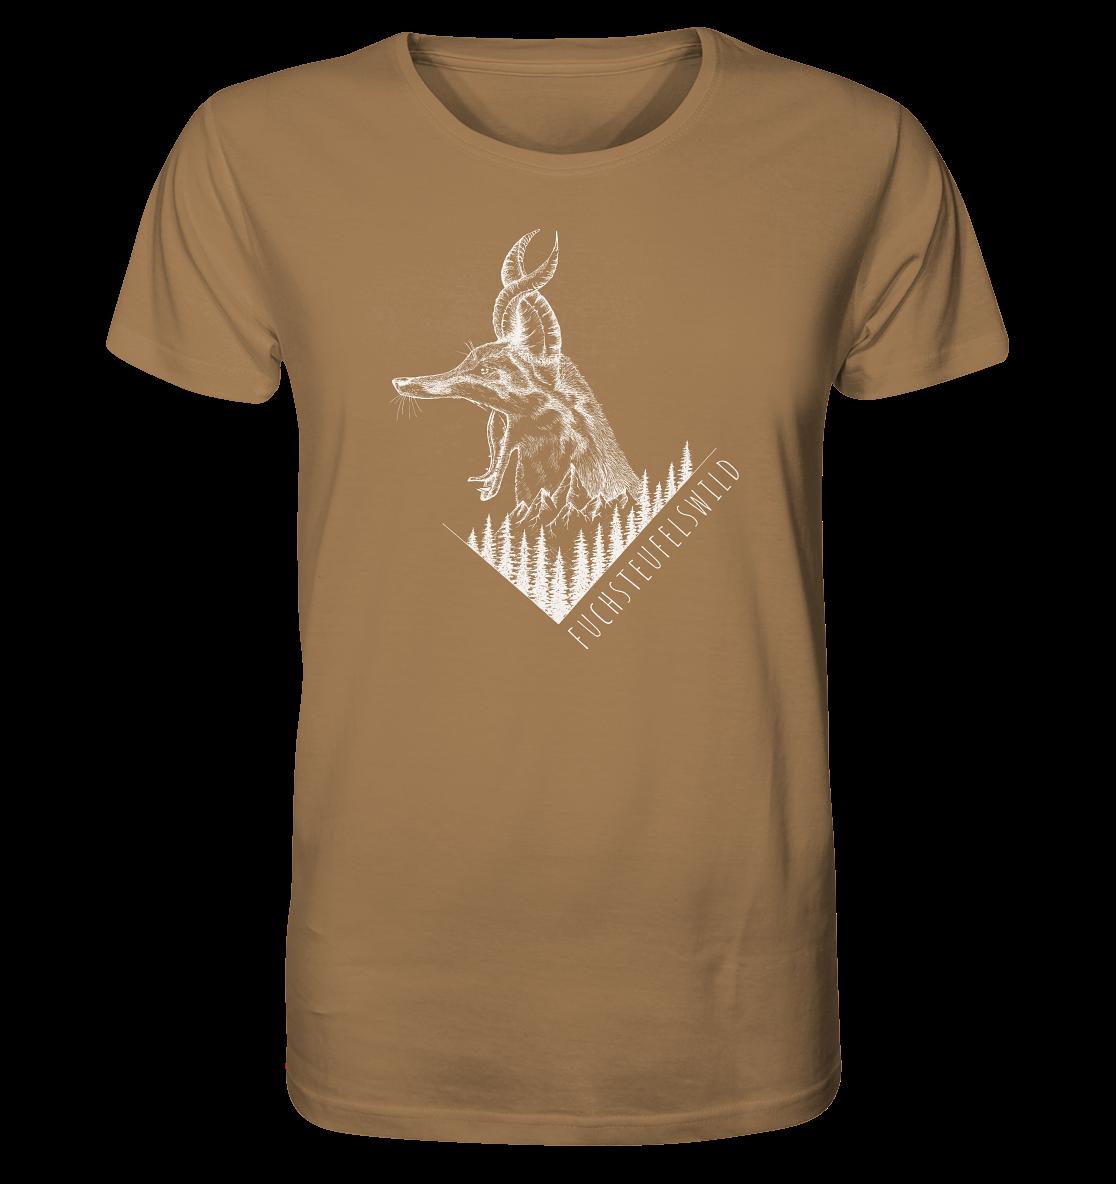 front-organic-shirt-a17c55-1116x-7.png